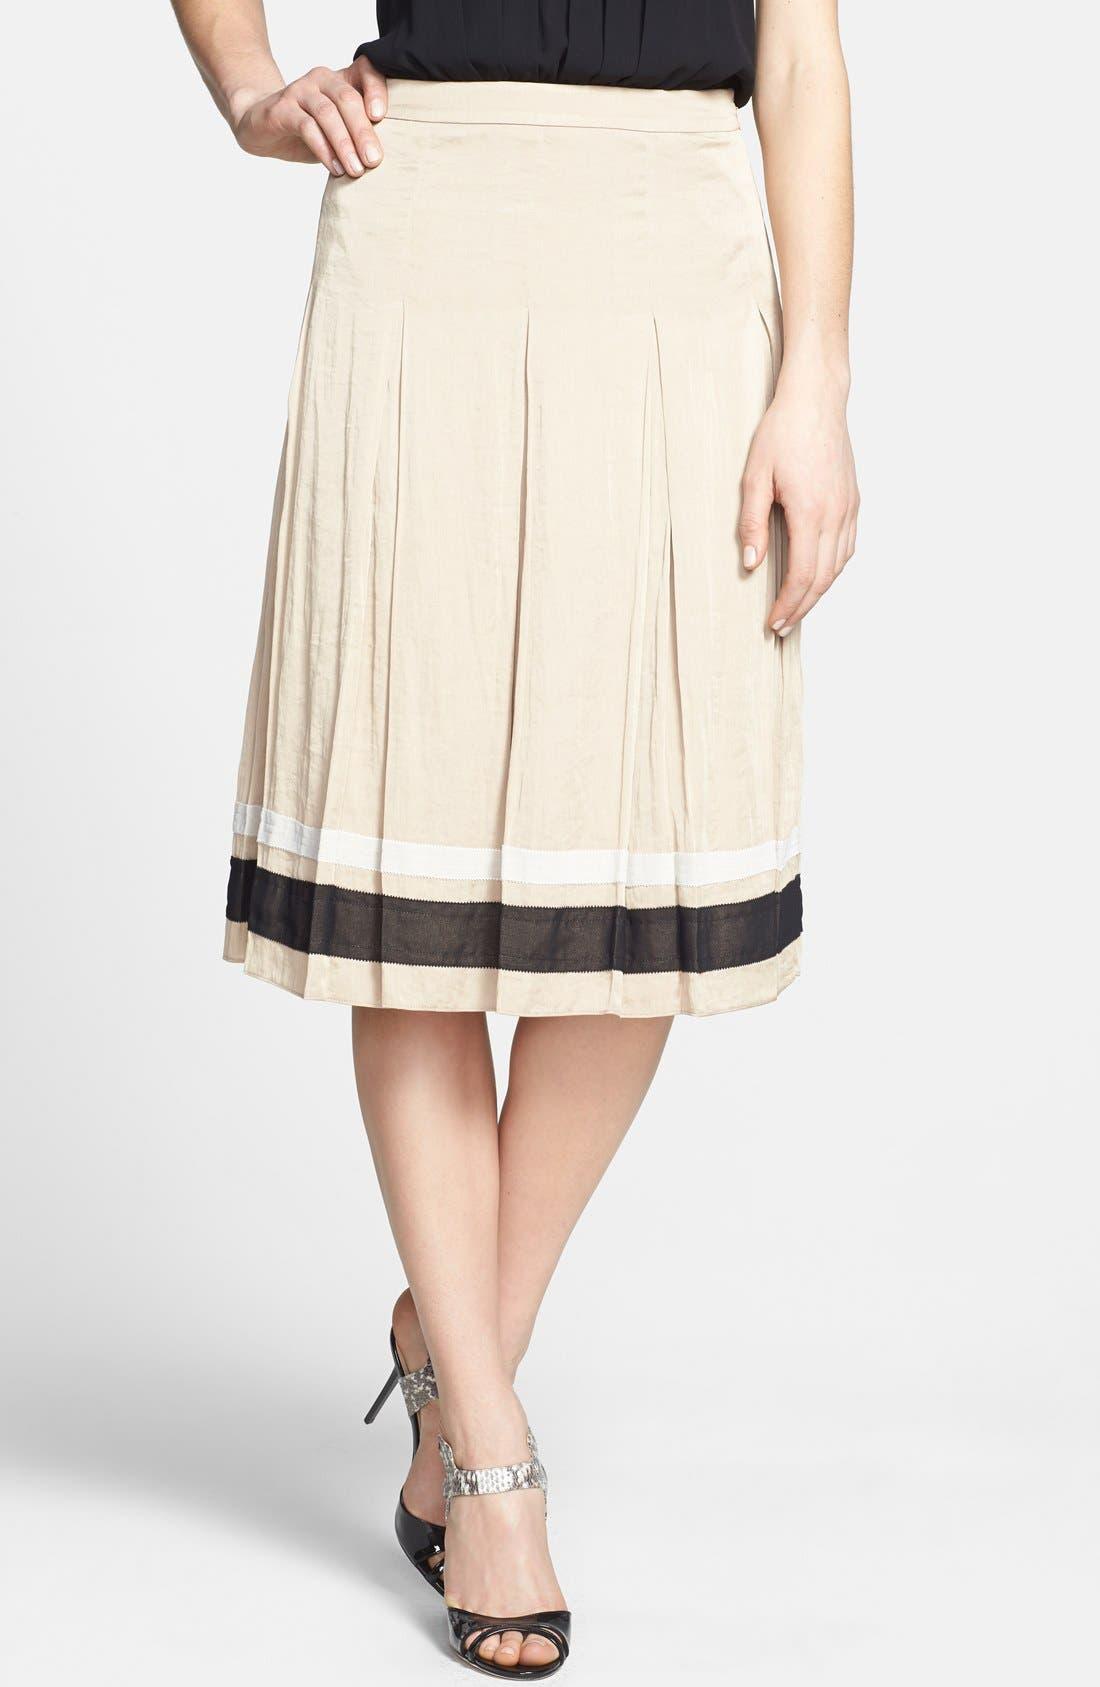 Alternate Image 1 Selected - Chelsea28 Ribbon Trim Pleated Skirt